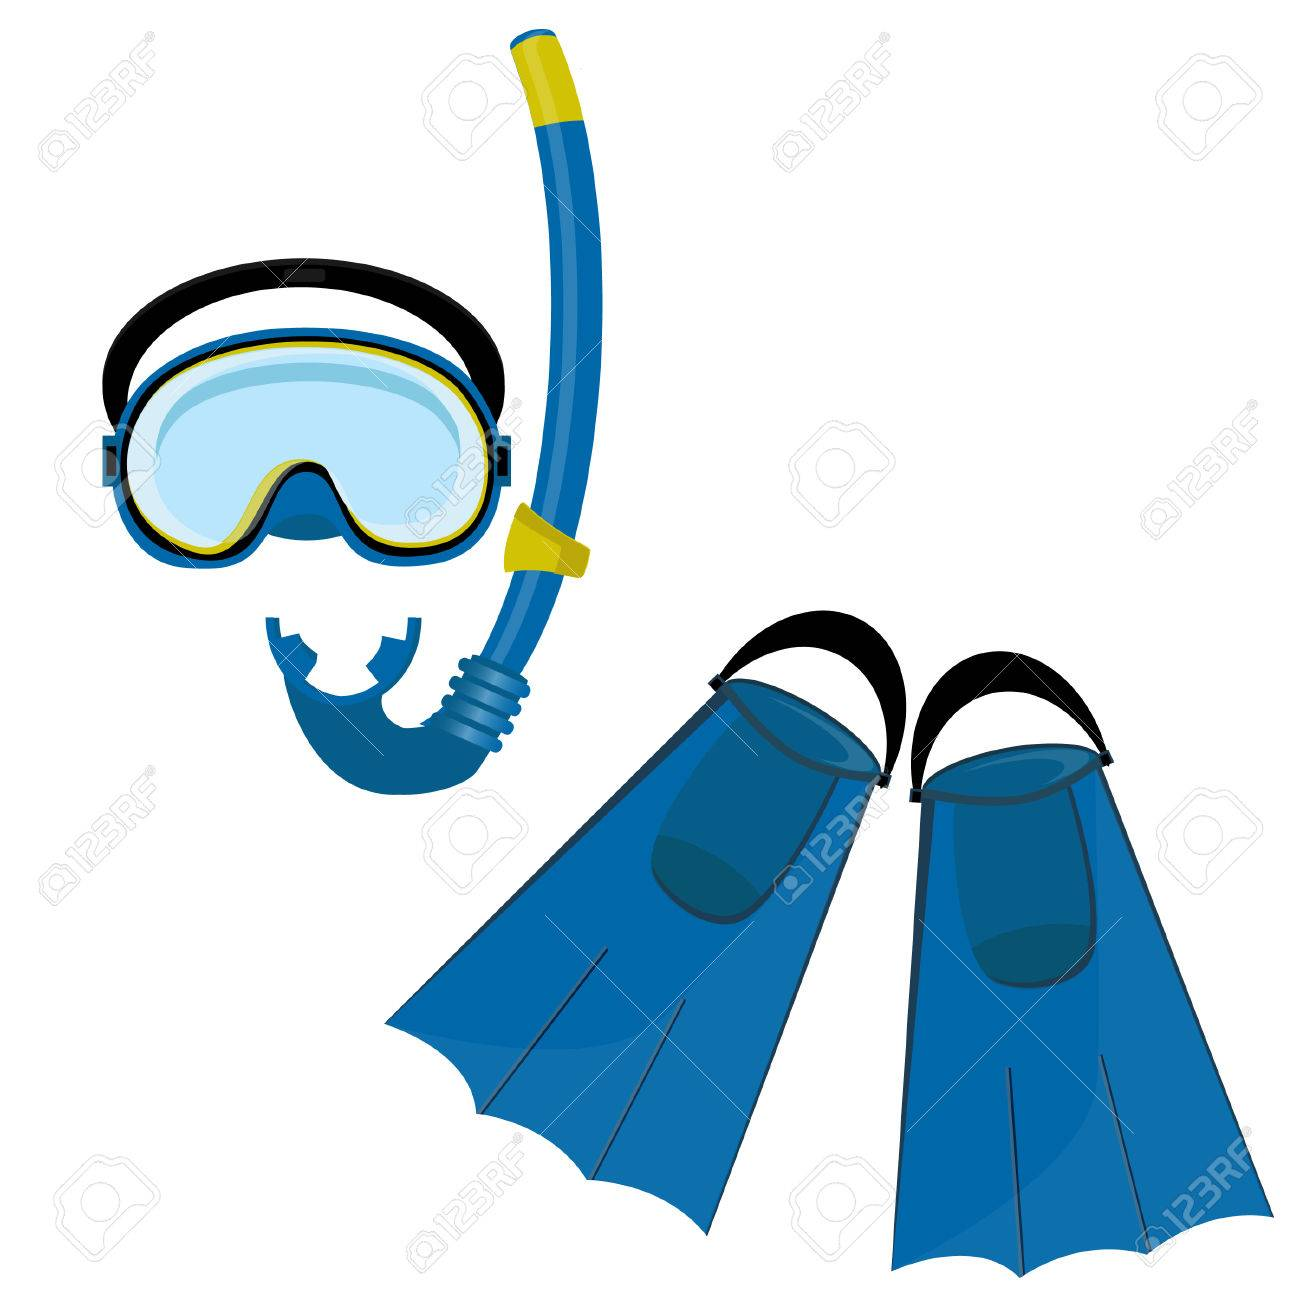 fd1b0b755b8 Blue diving maks, diving tube, swimming equipment, flippers Stock Vector -  40215894